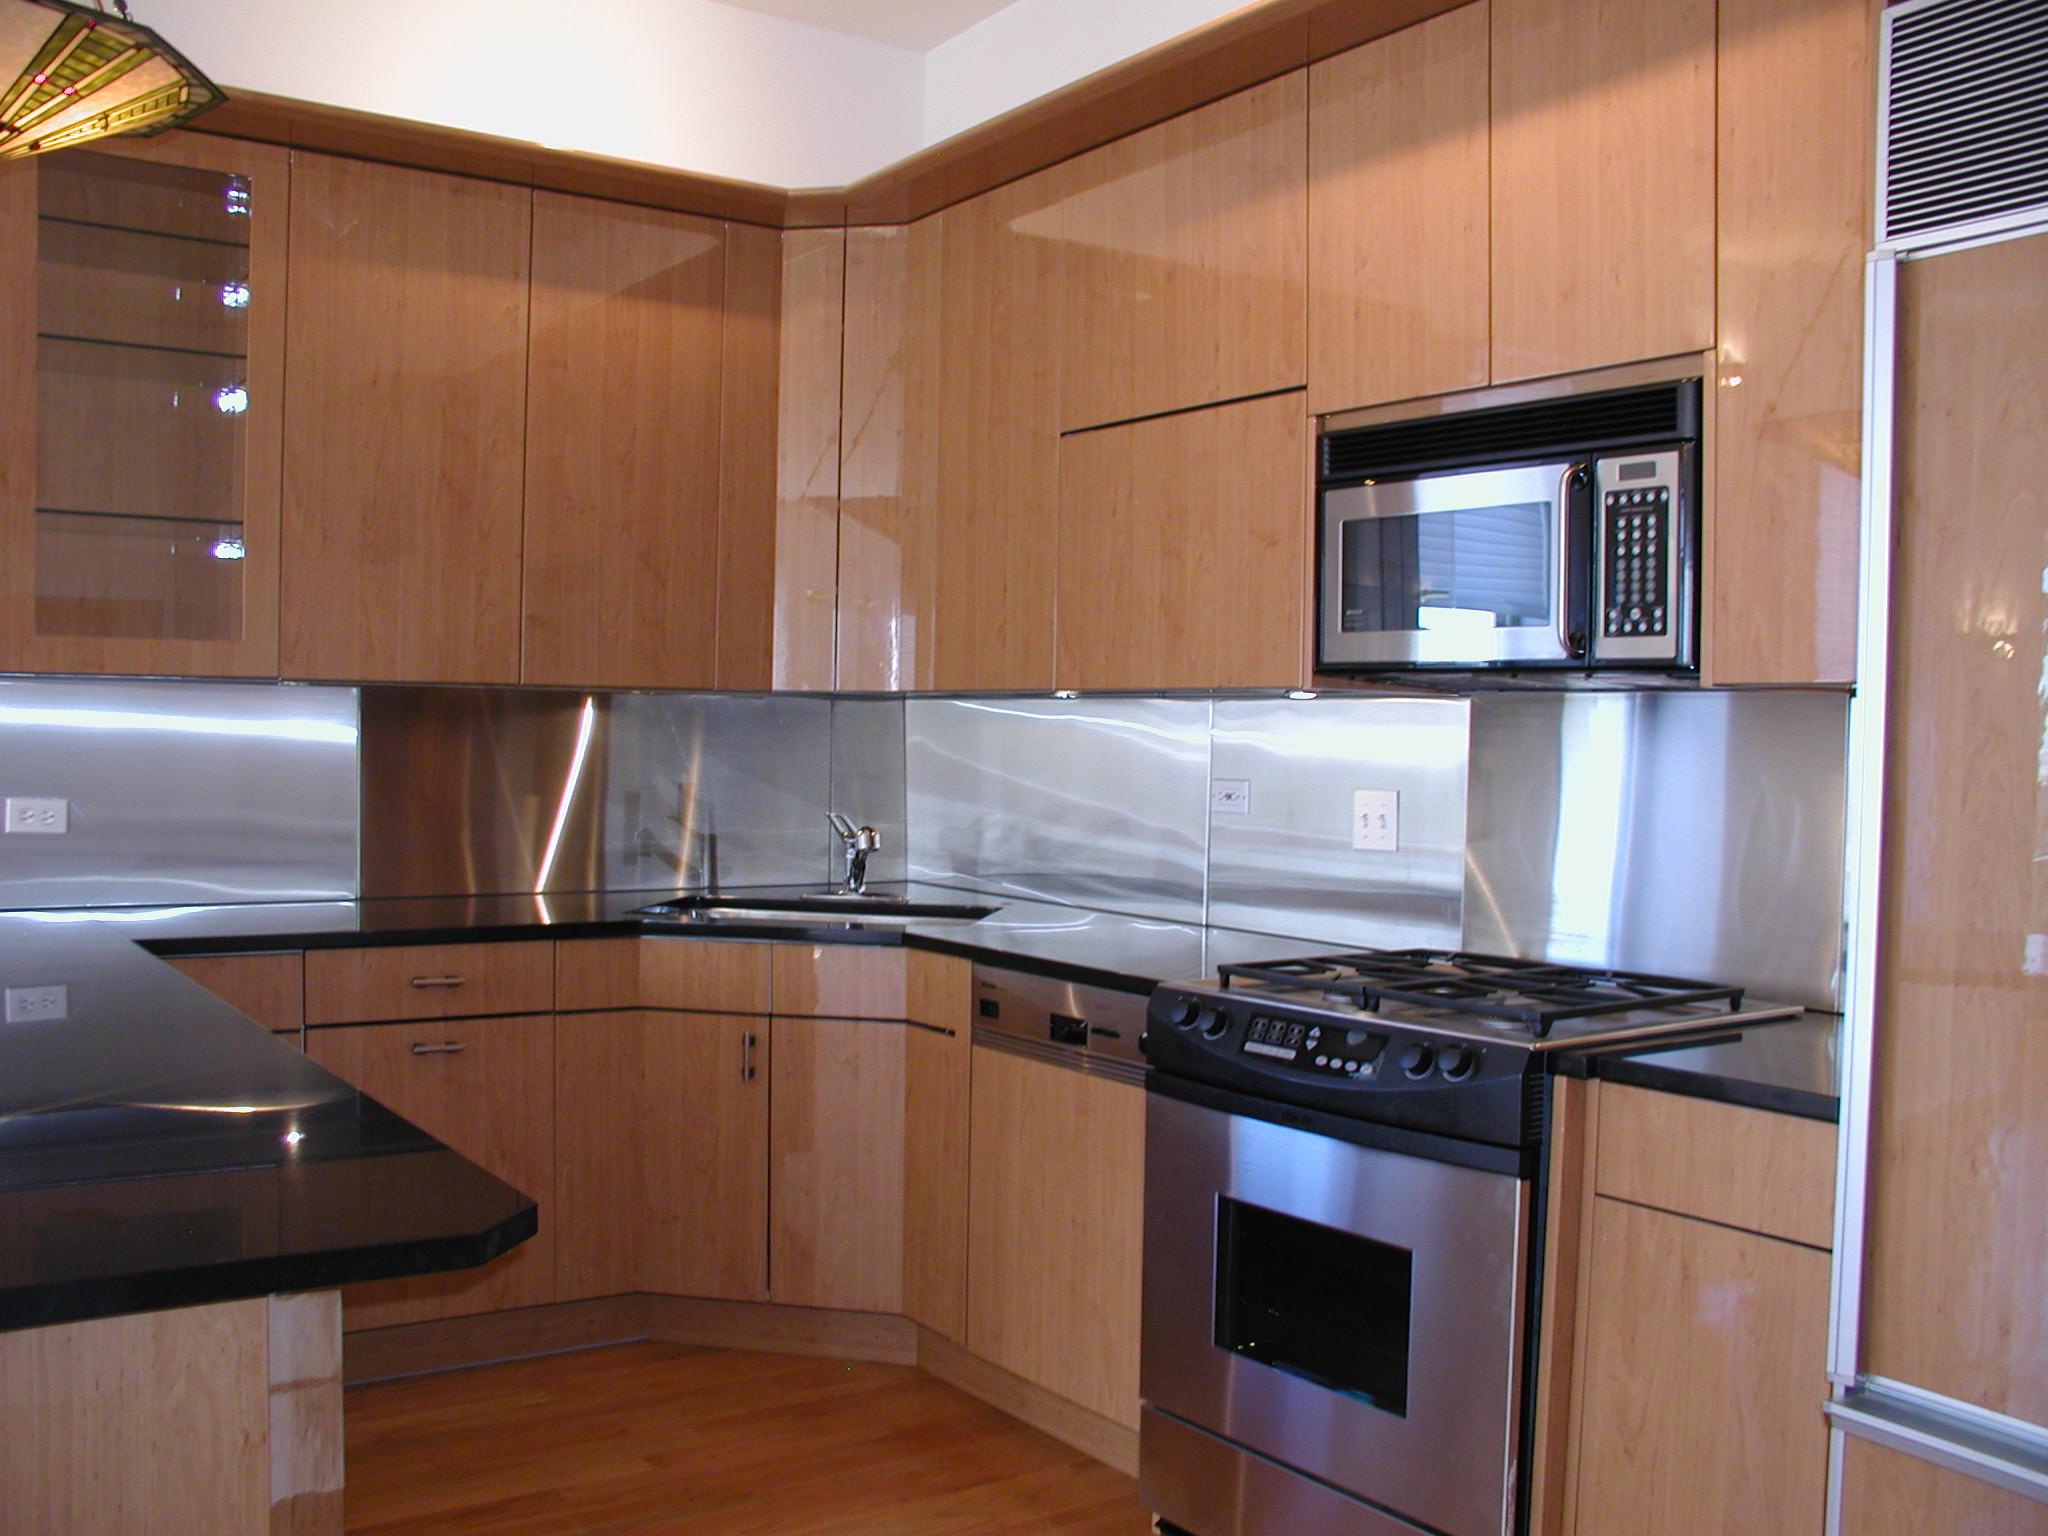 metal kitchen backsplash decorative floor mats stainless steel sheets  home decor